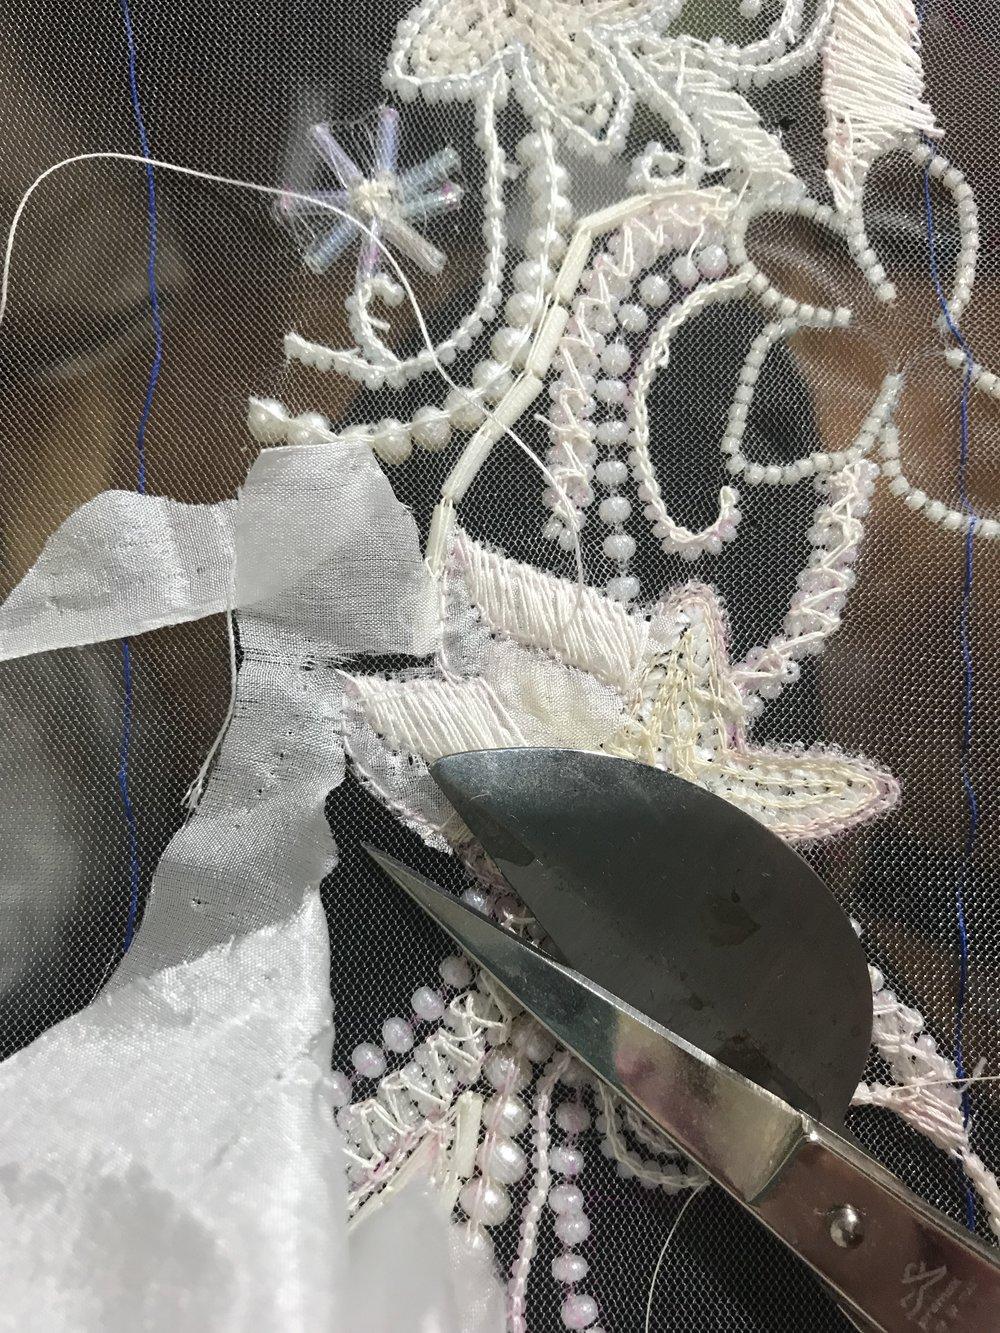 trimming silk habotai with duckbill scissors